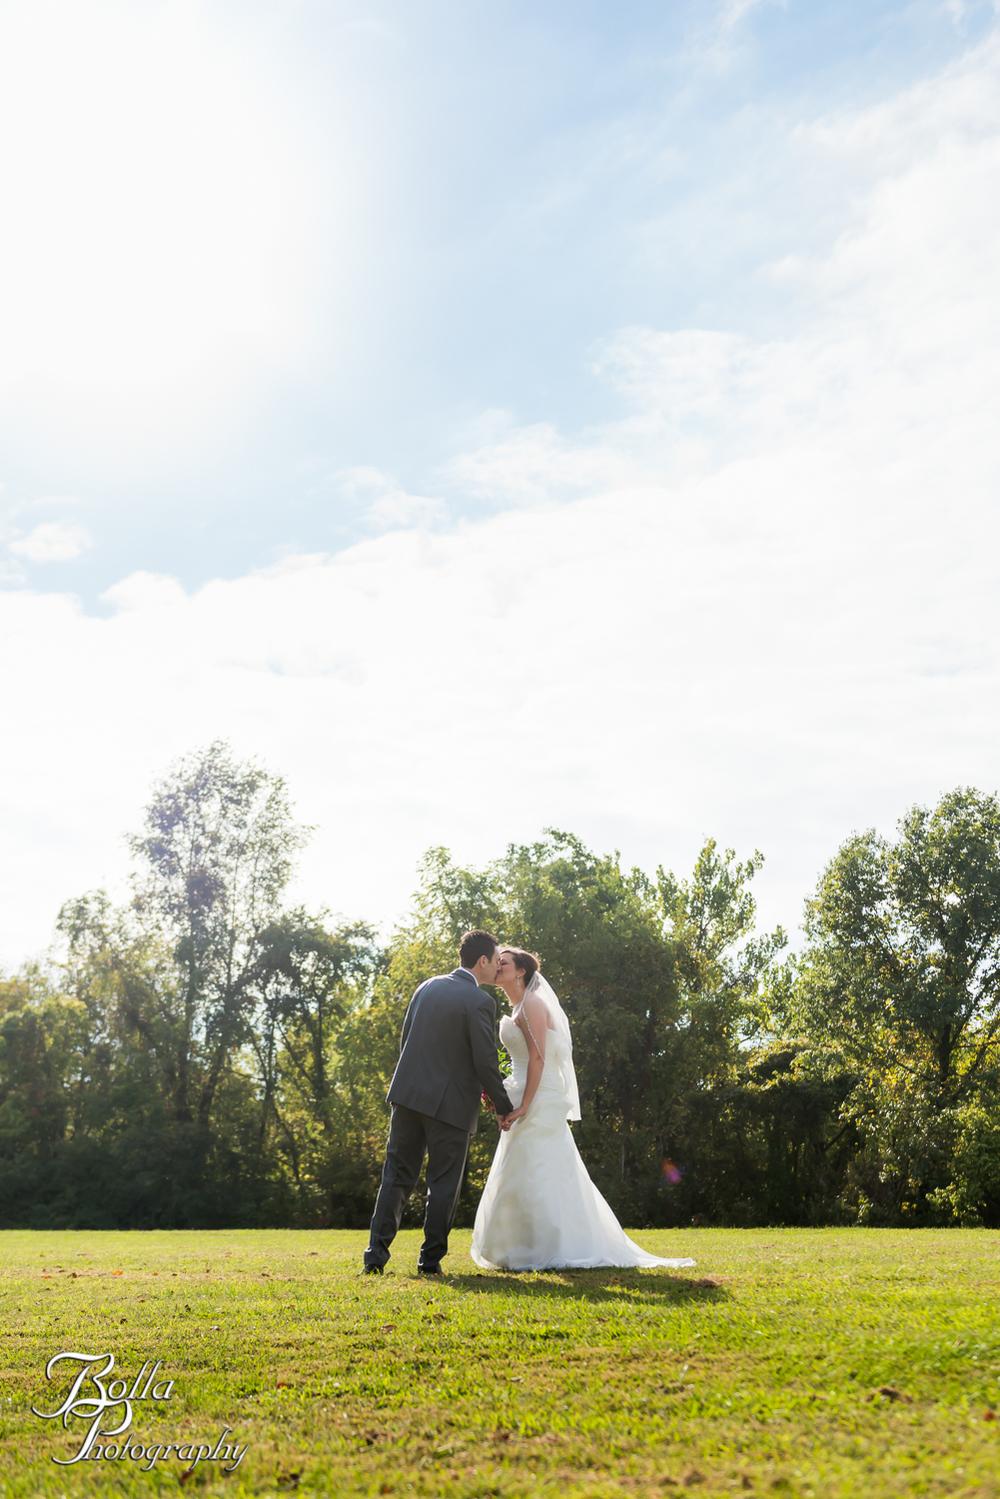 Bolla_Photography_St_Louis_wedding_photographer-0346.jpg